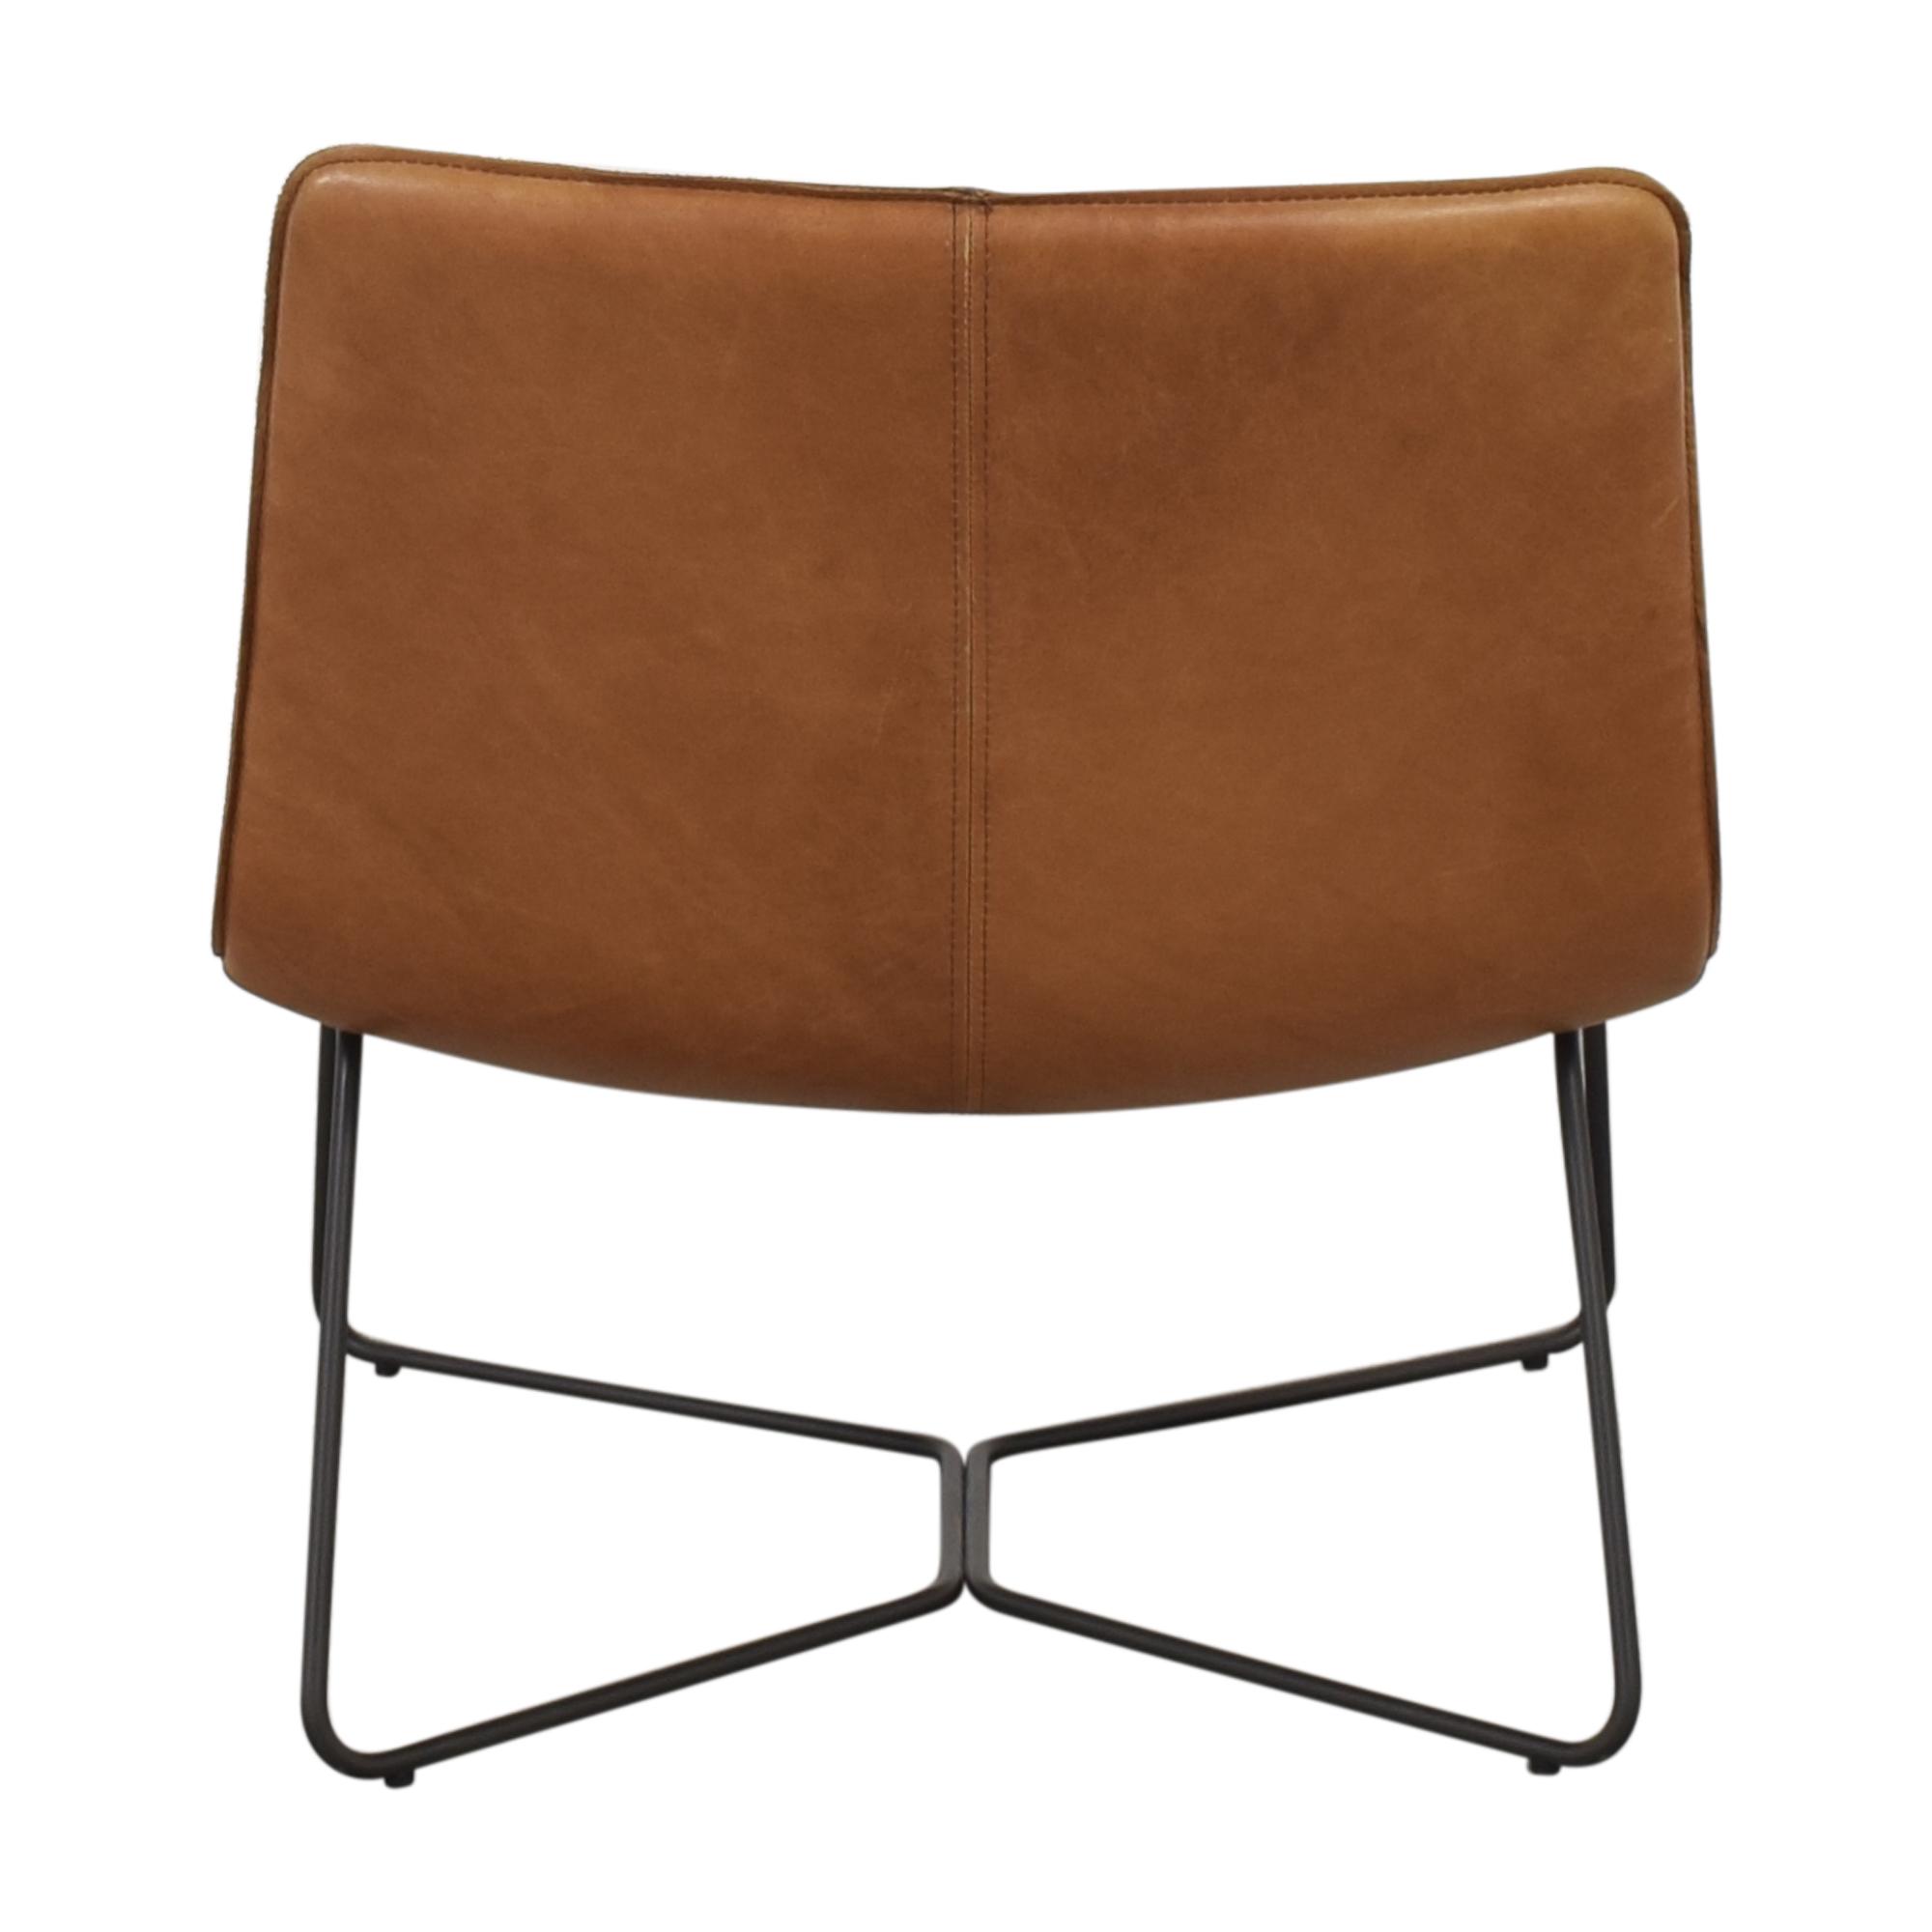 shop West Elm Slope Leather Lounge Chair West Elm